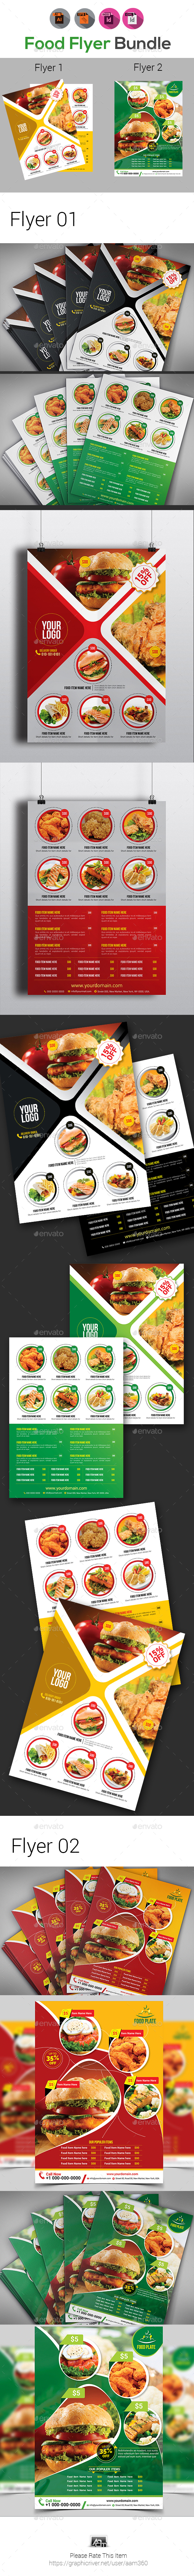 Food Flyer Bundle Templates - Restaurant Flyers